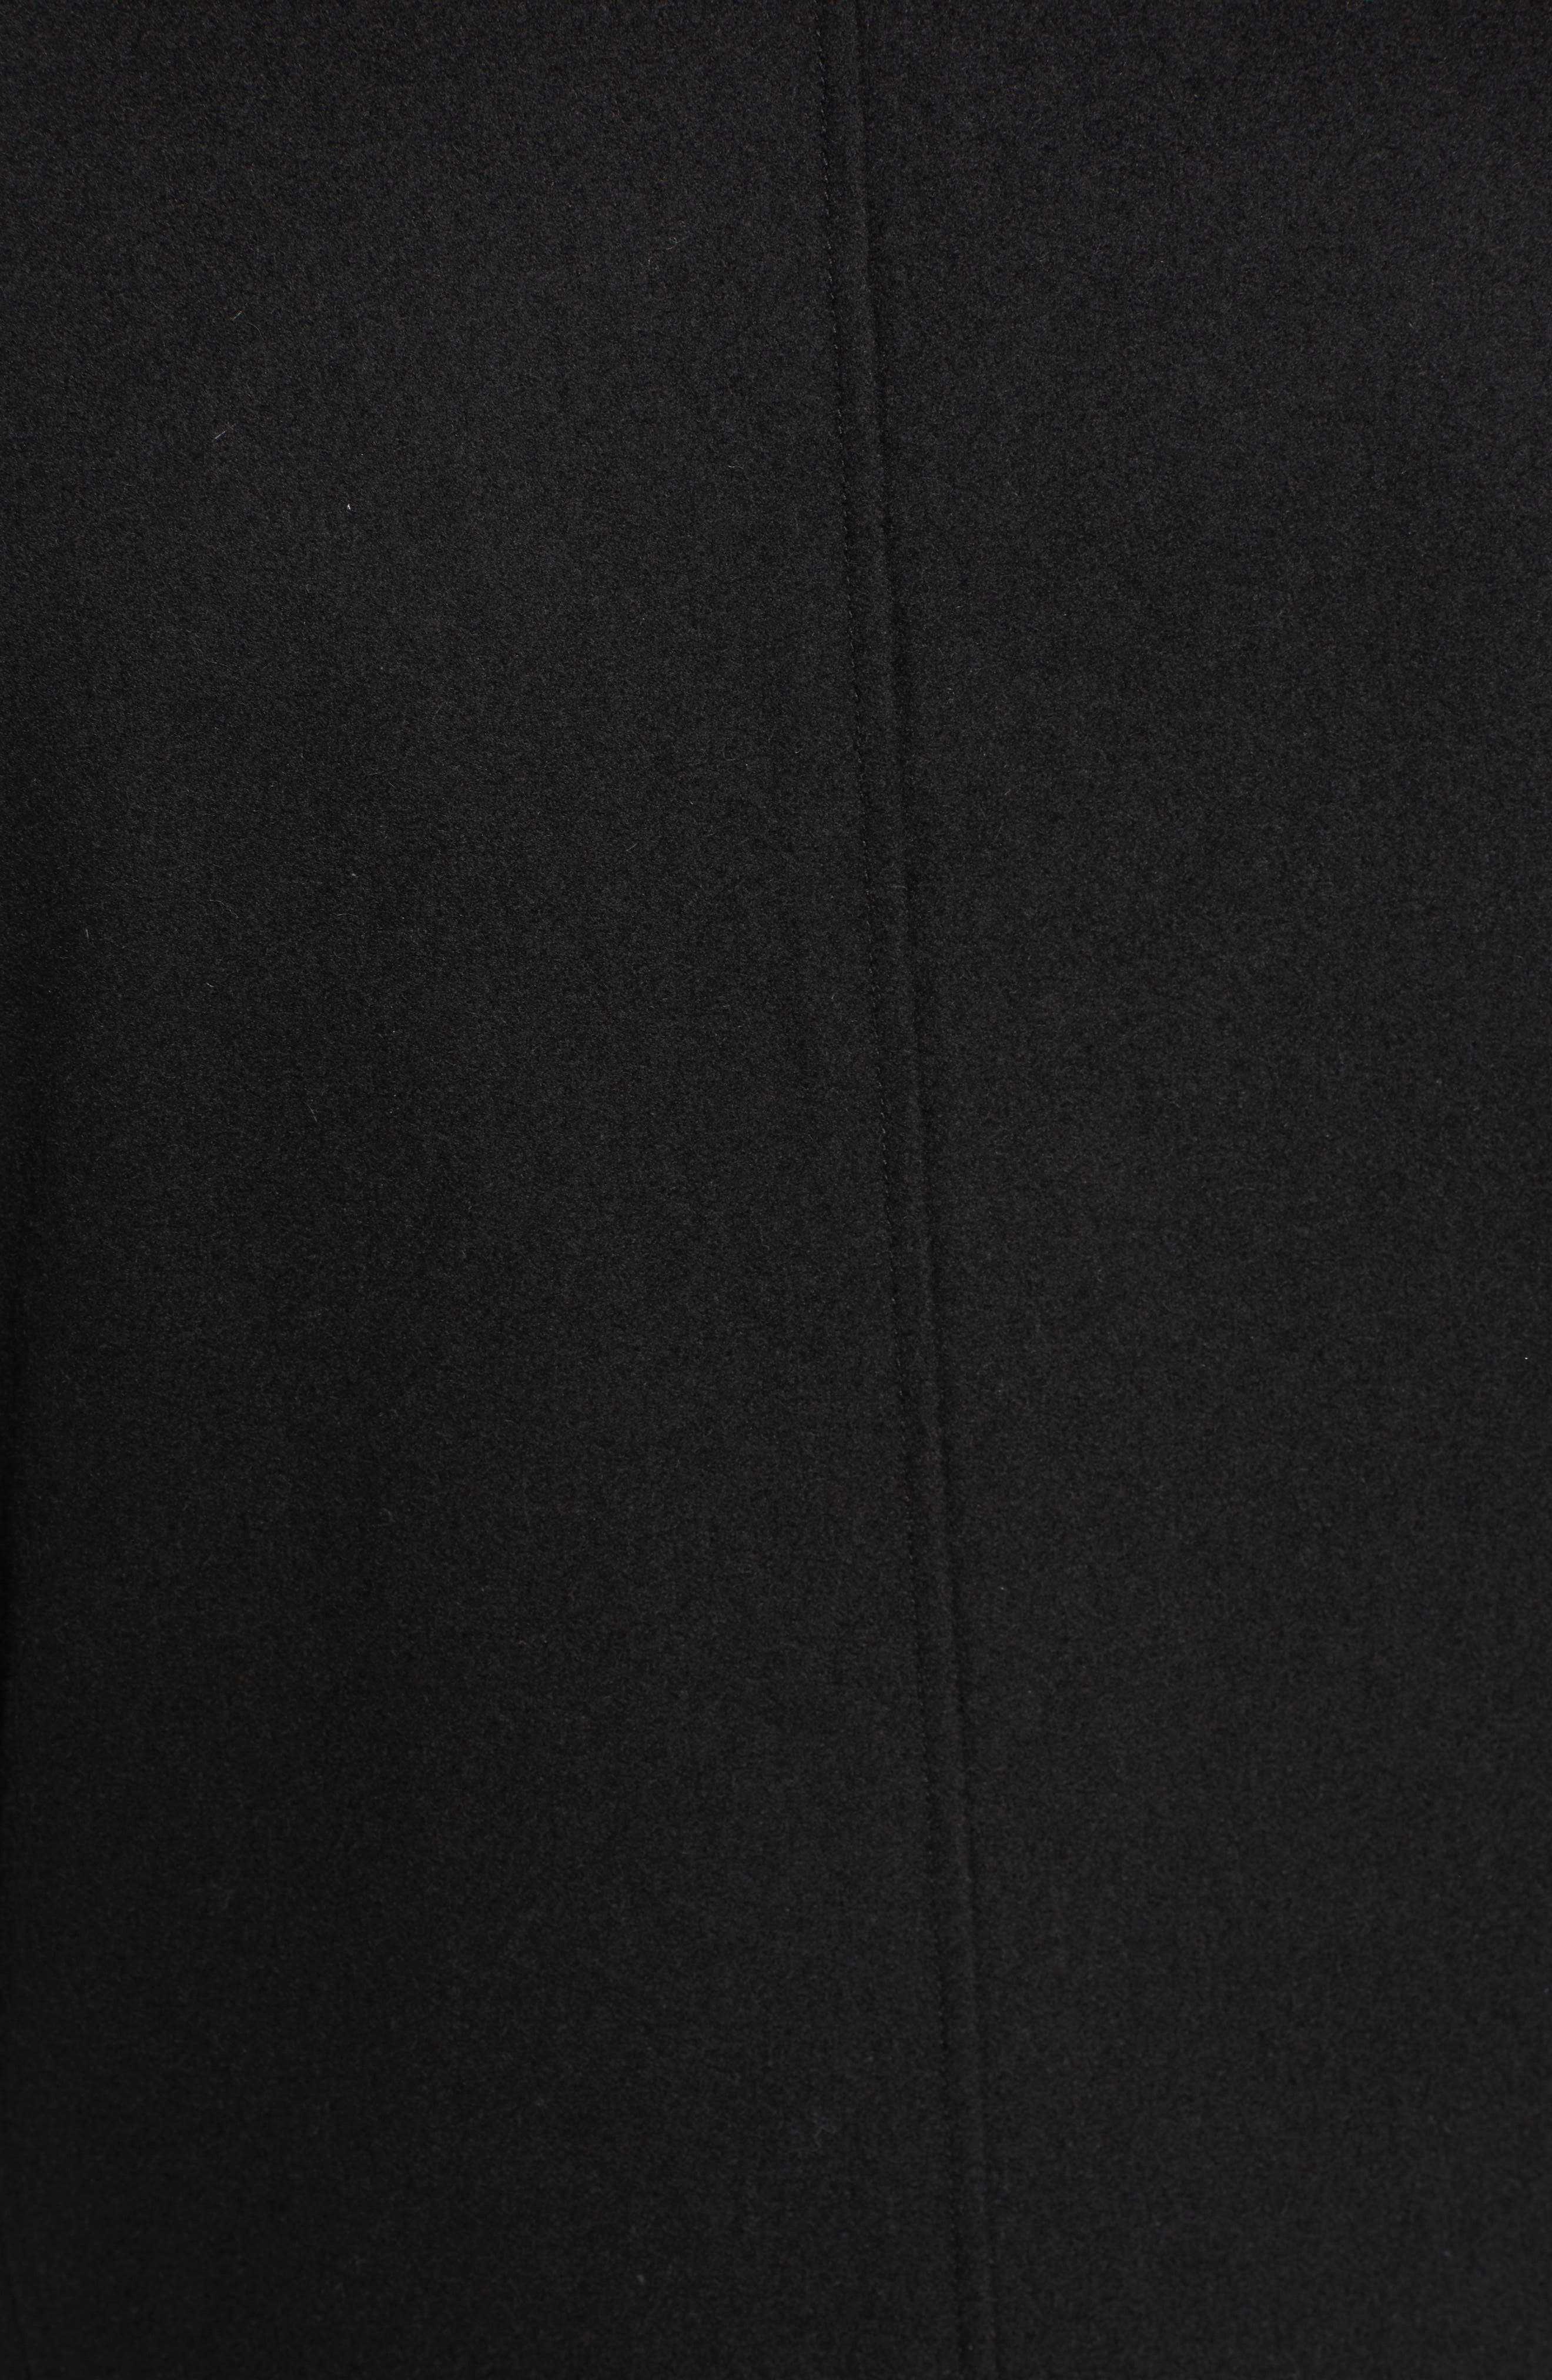 Wool Blend 3-in-1 Topcoat,                             Alternate thumbnail 5, color,                             001